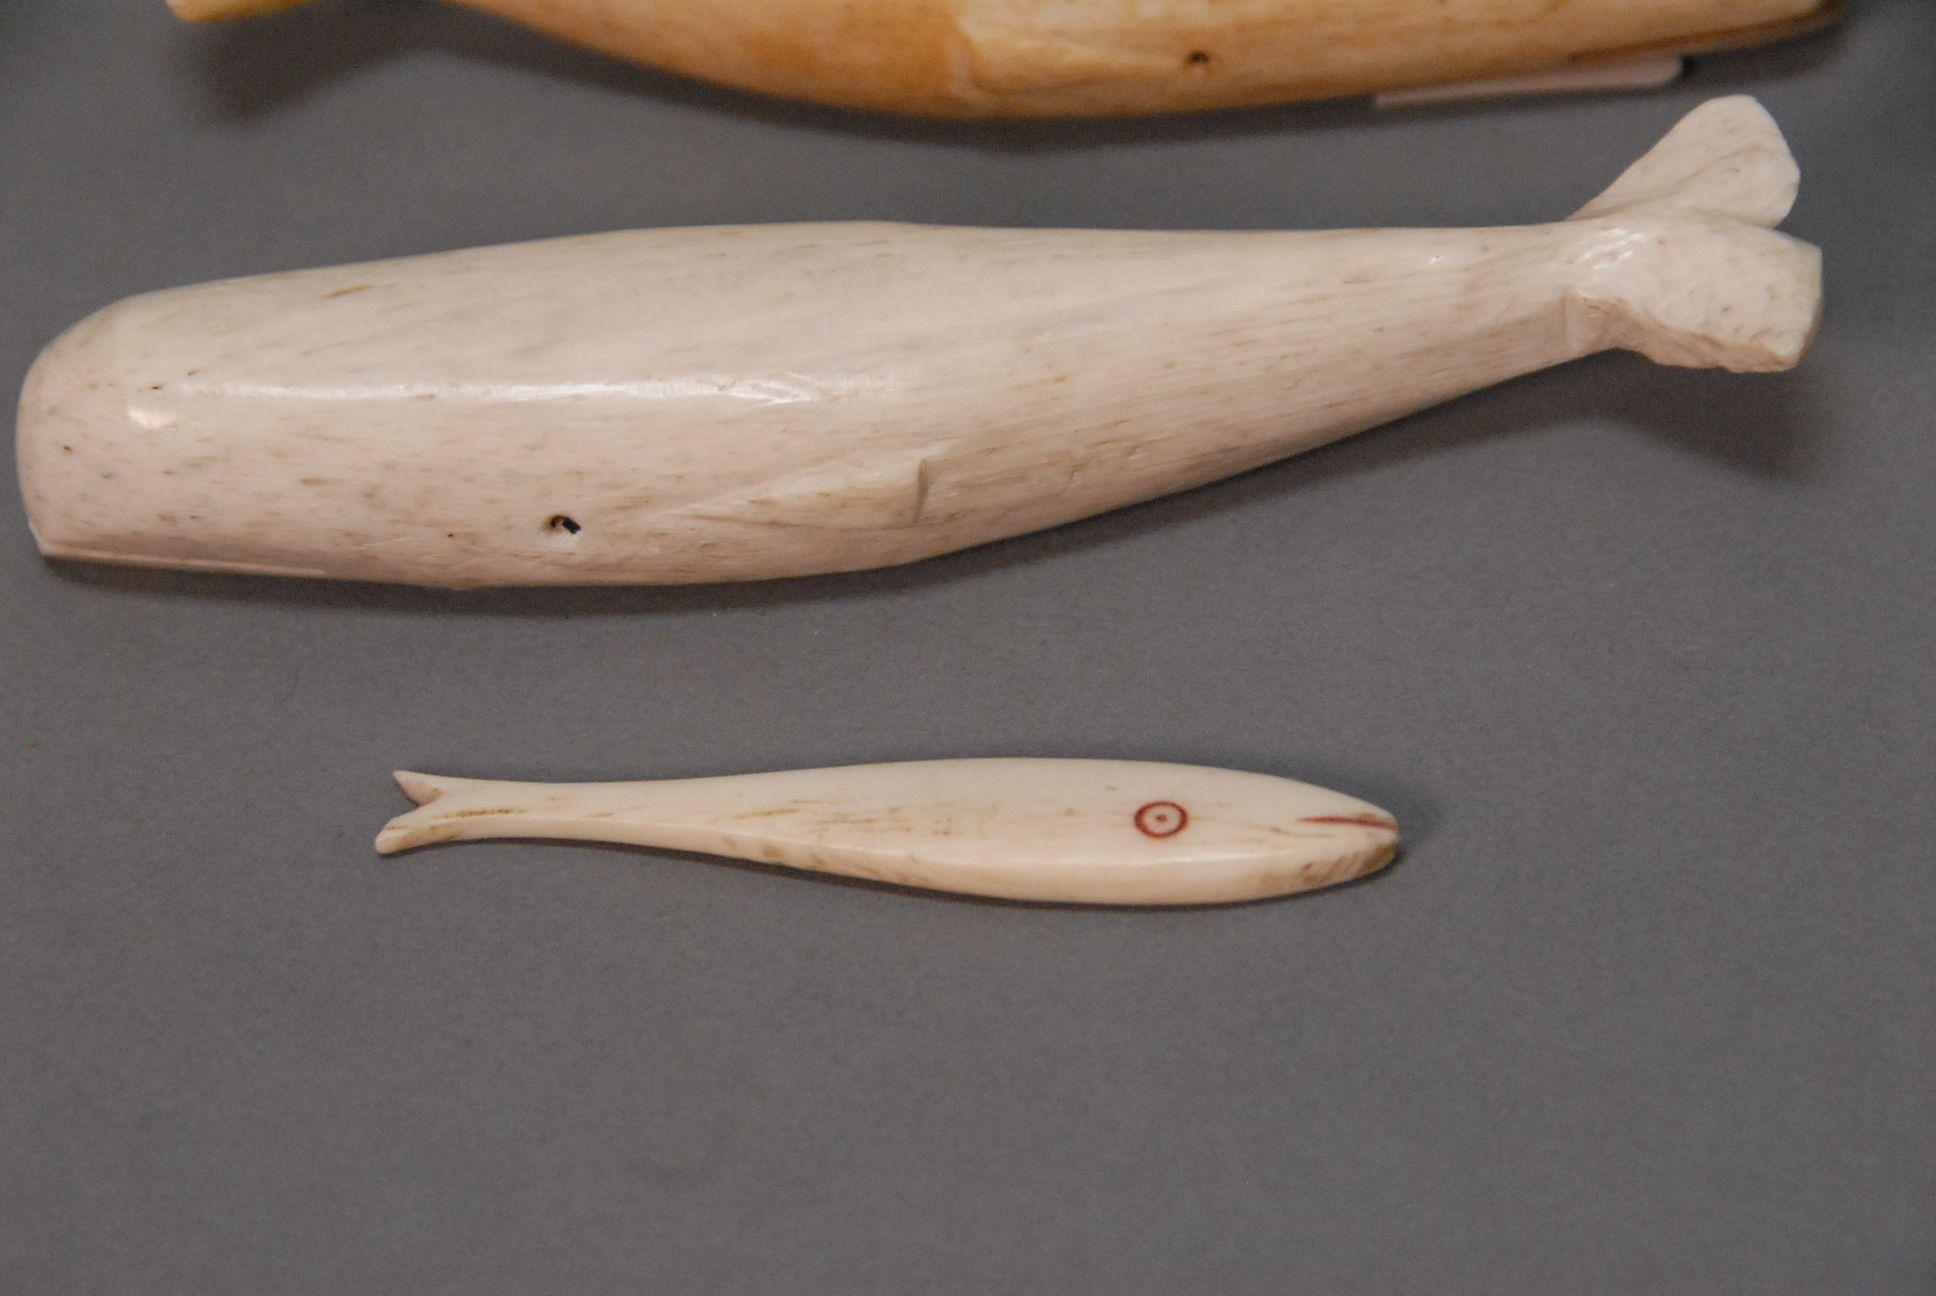 Antique Whalebone Carvings Bone Carving Inuit Art Carving